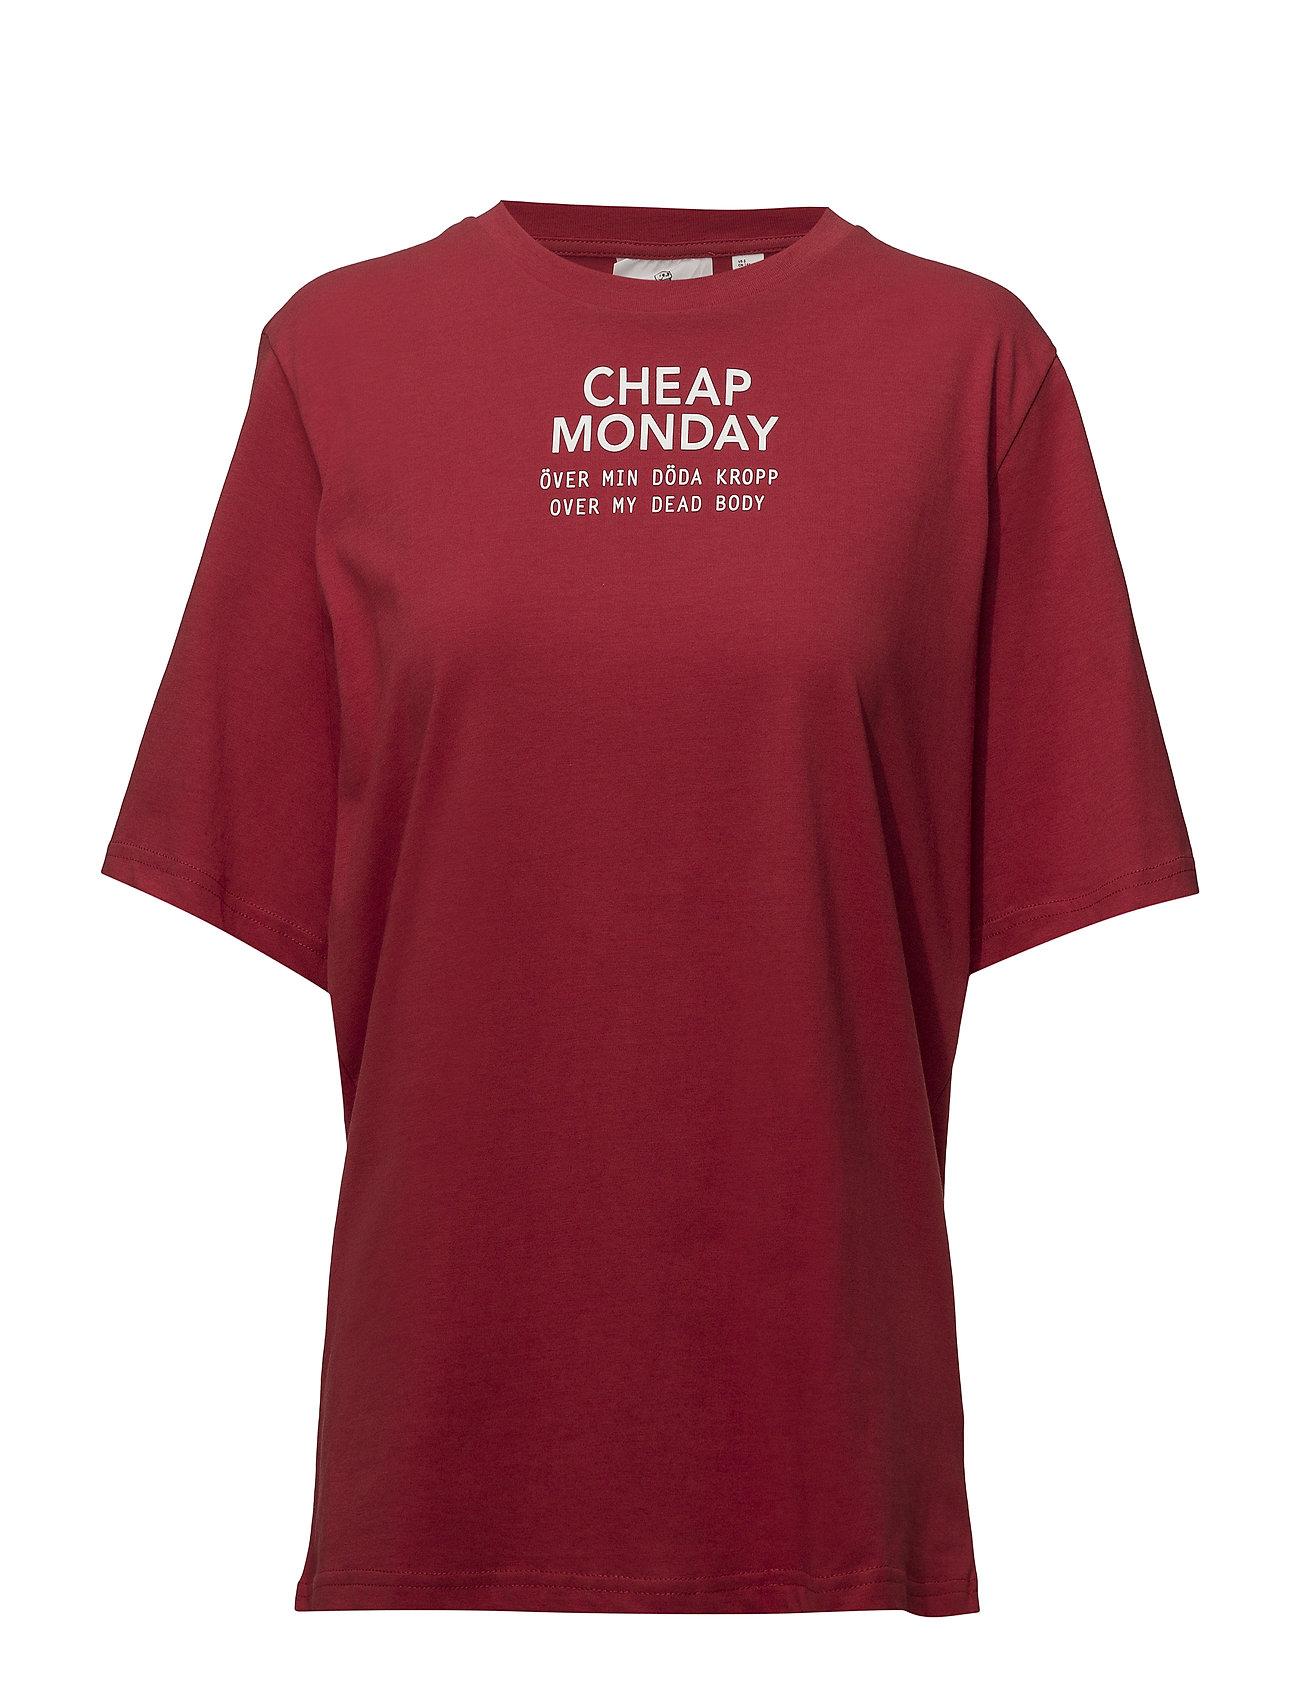 Cheap Monday Perfect tee Chp mnd sender - DK RED